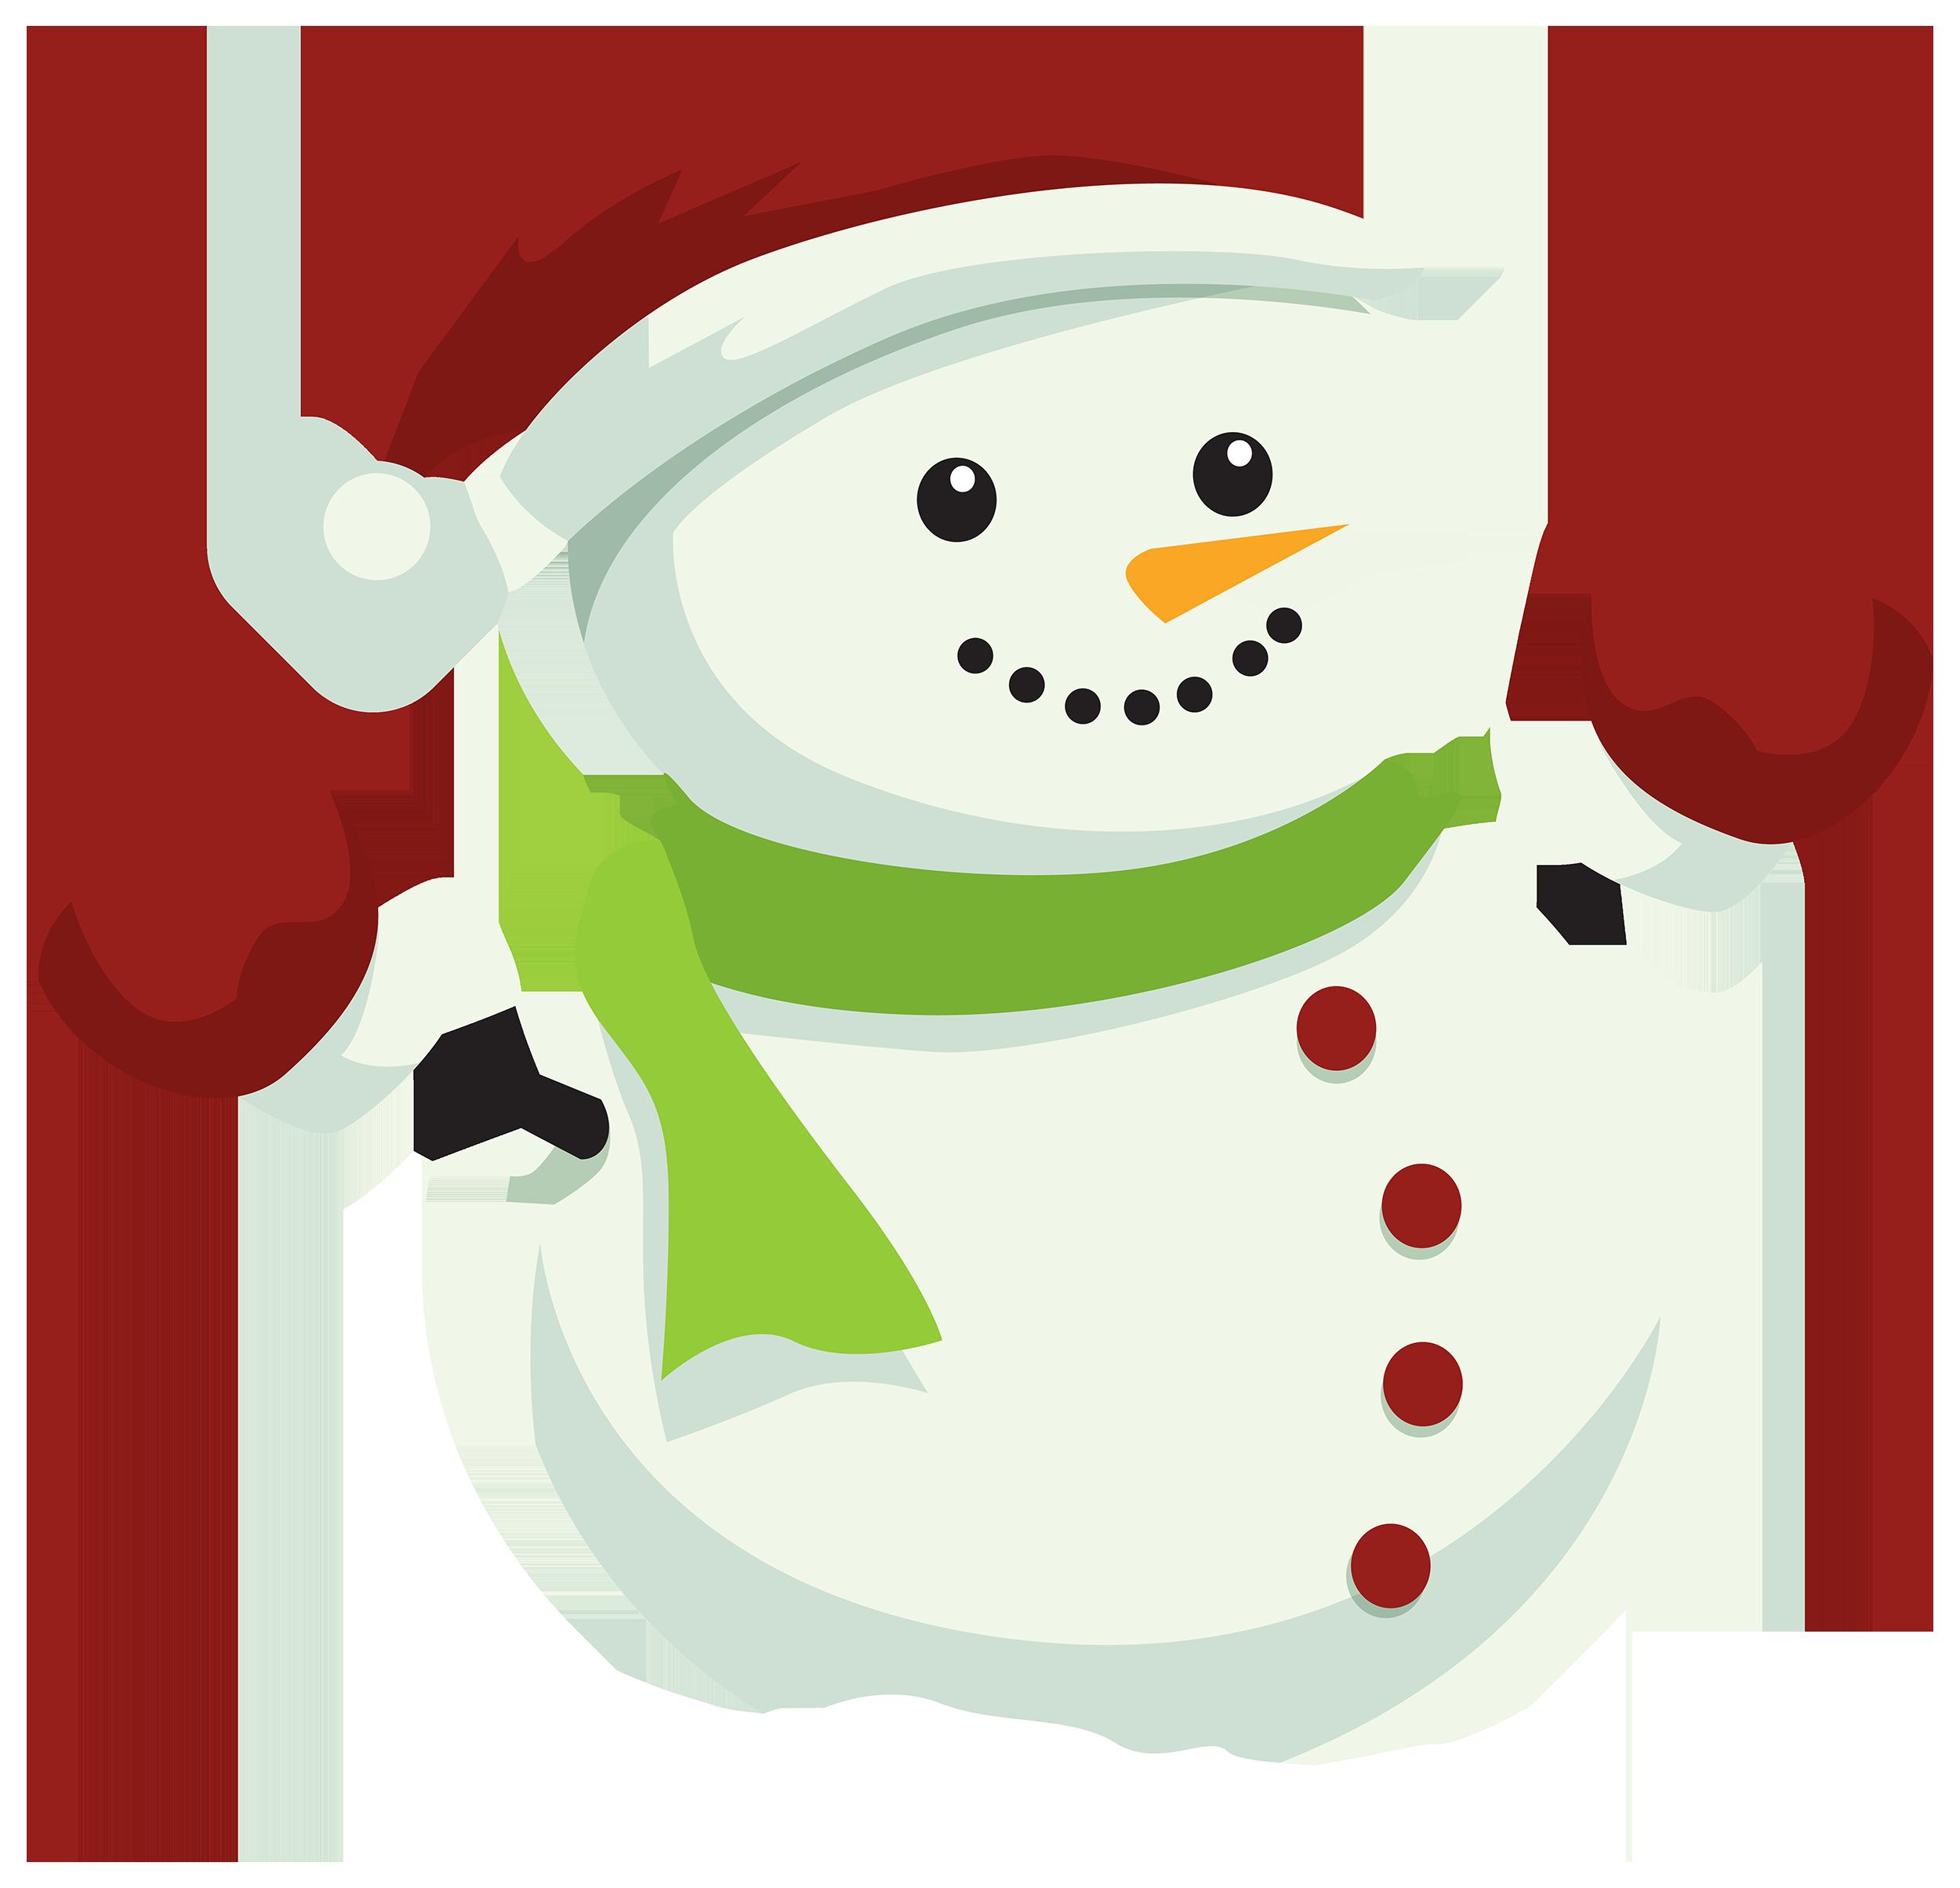 Snowman PNG image